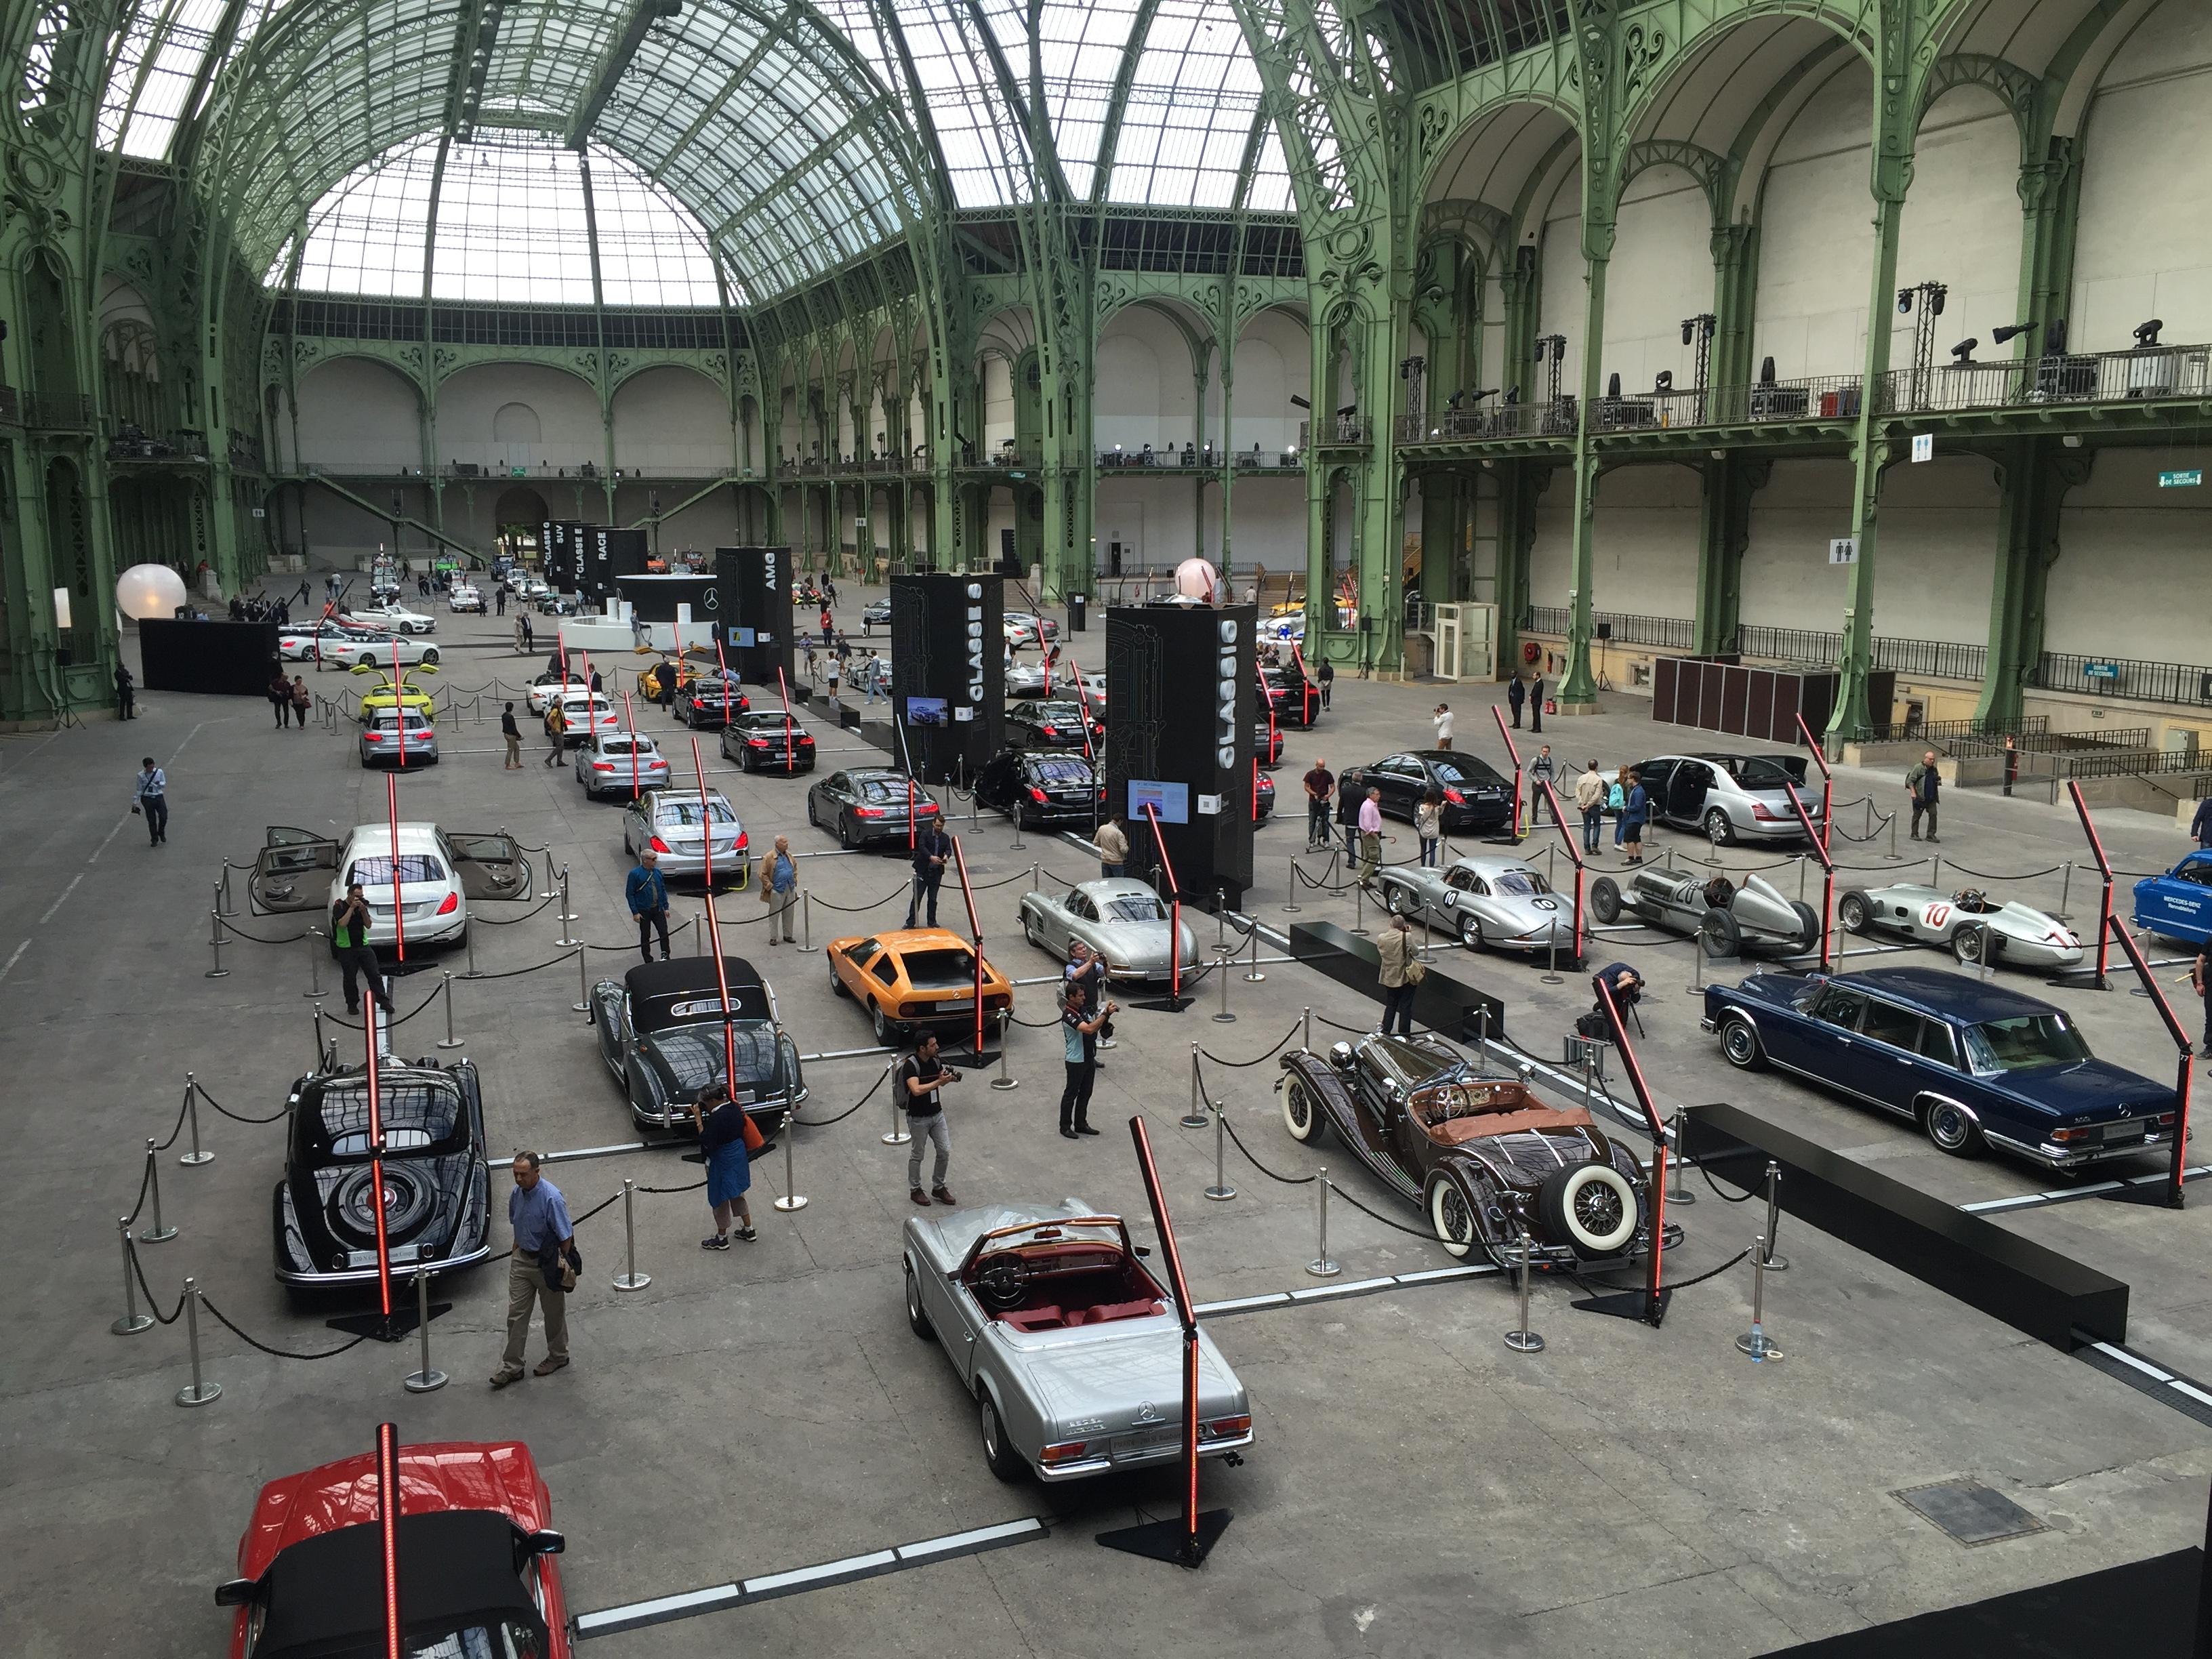 Exposition mercedes au grand palais le reportage vid o - Expo le grand palais ...